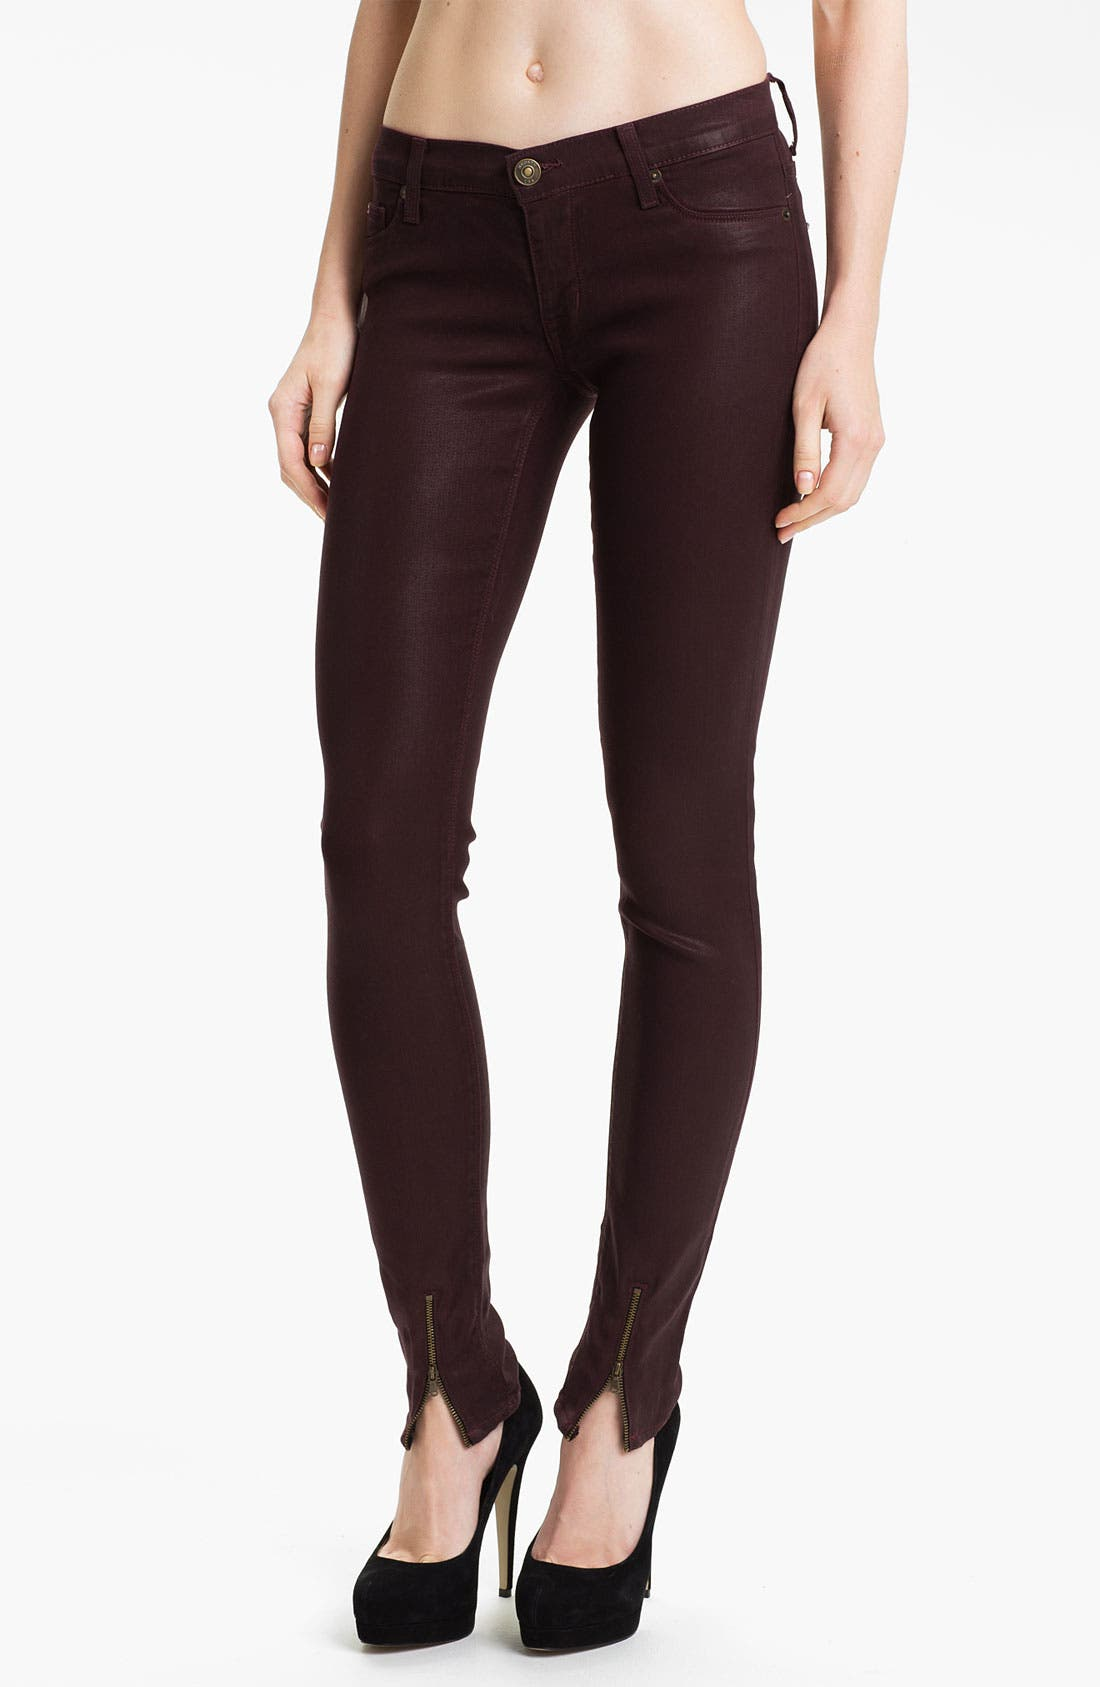 Alternate Image 1 Selected - Hudson Jeans Super Skinny Jeans (Bordeaux Wax)